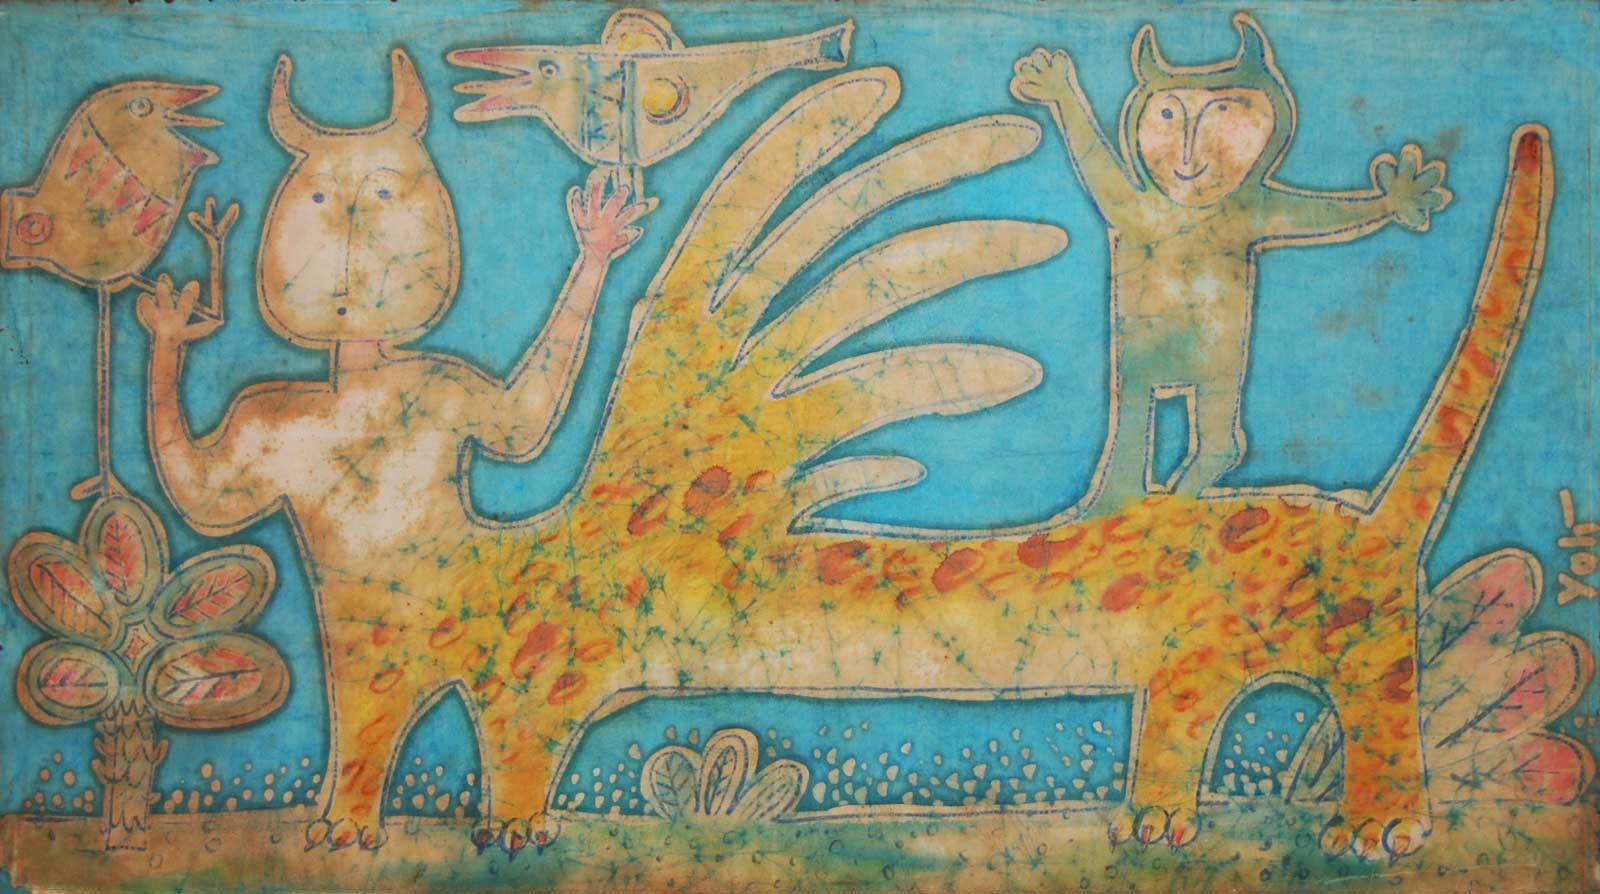 Yolanda Zerboni, Fantasy (2000) - Tecnica mista su stoffa, 149x87cm